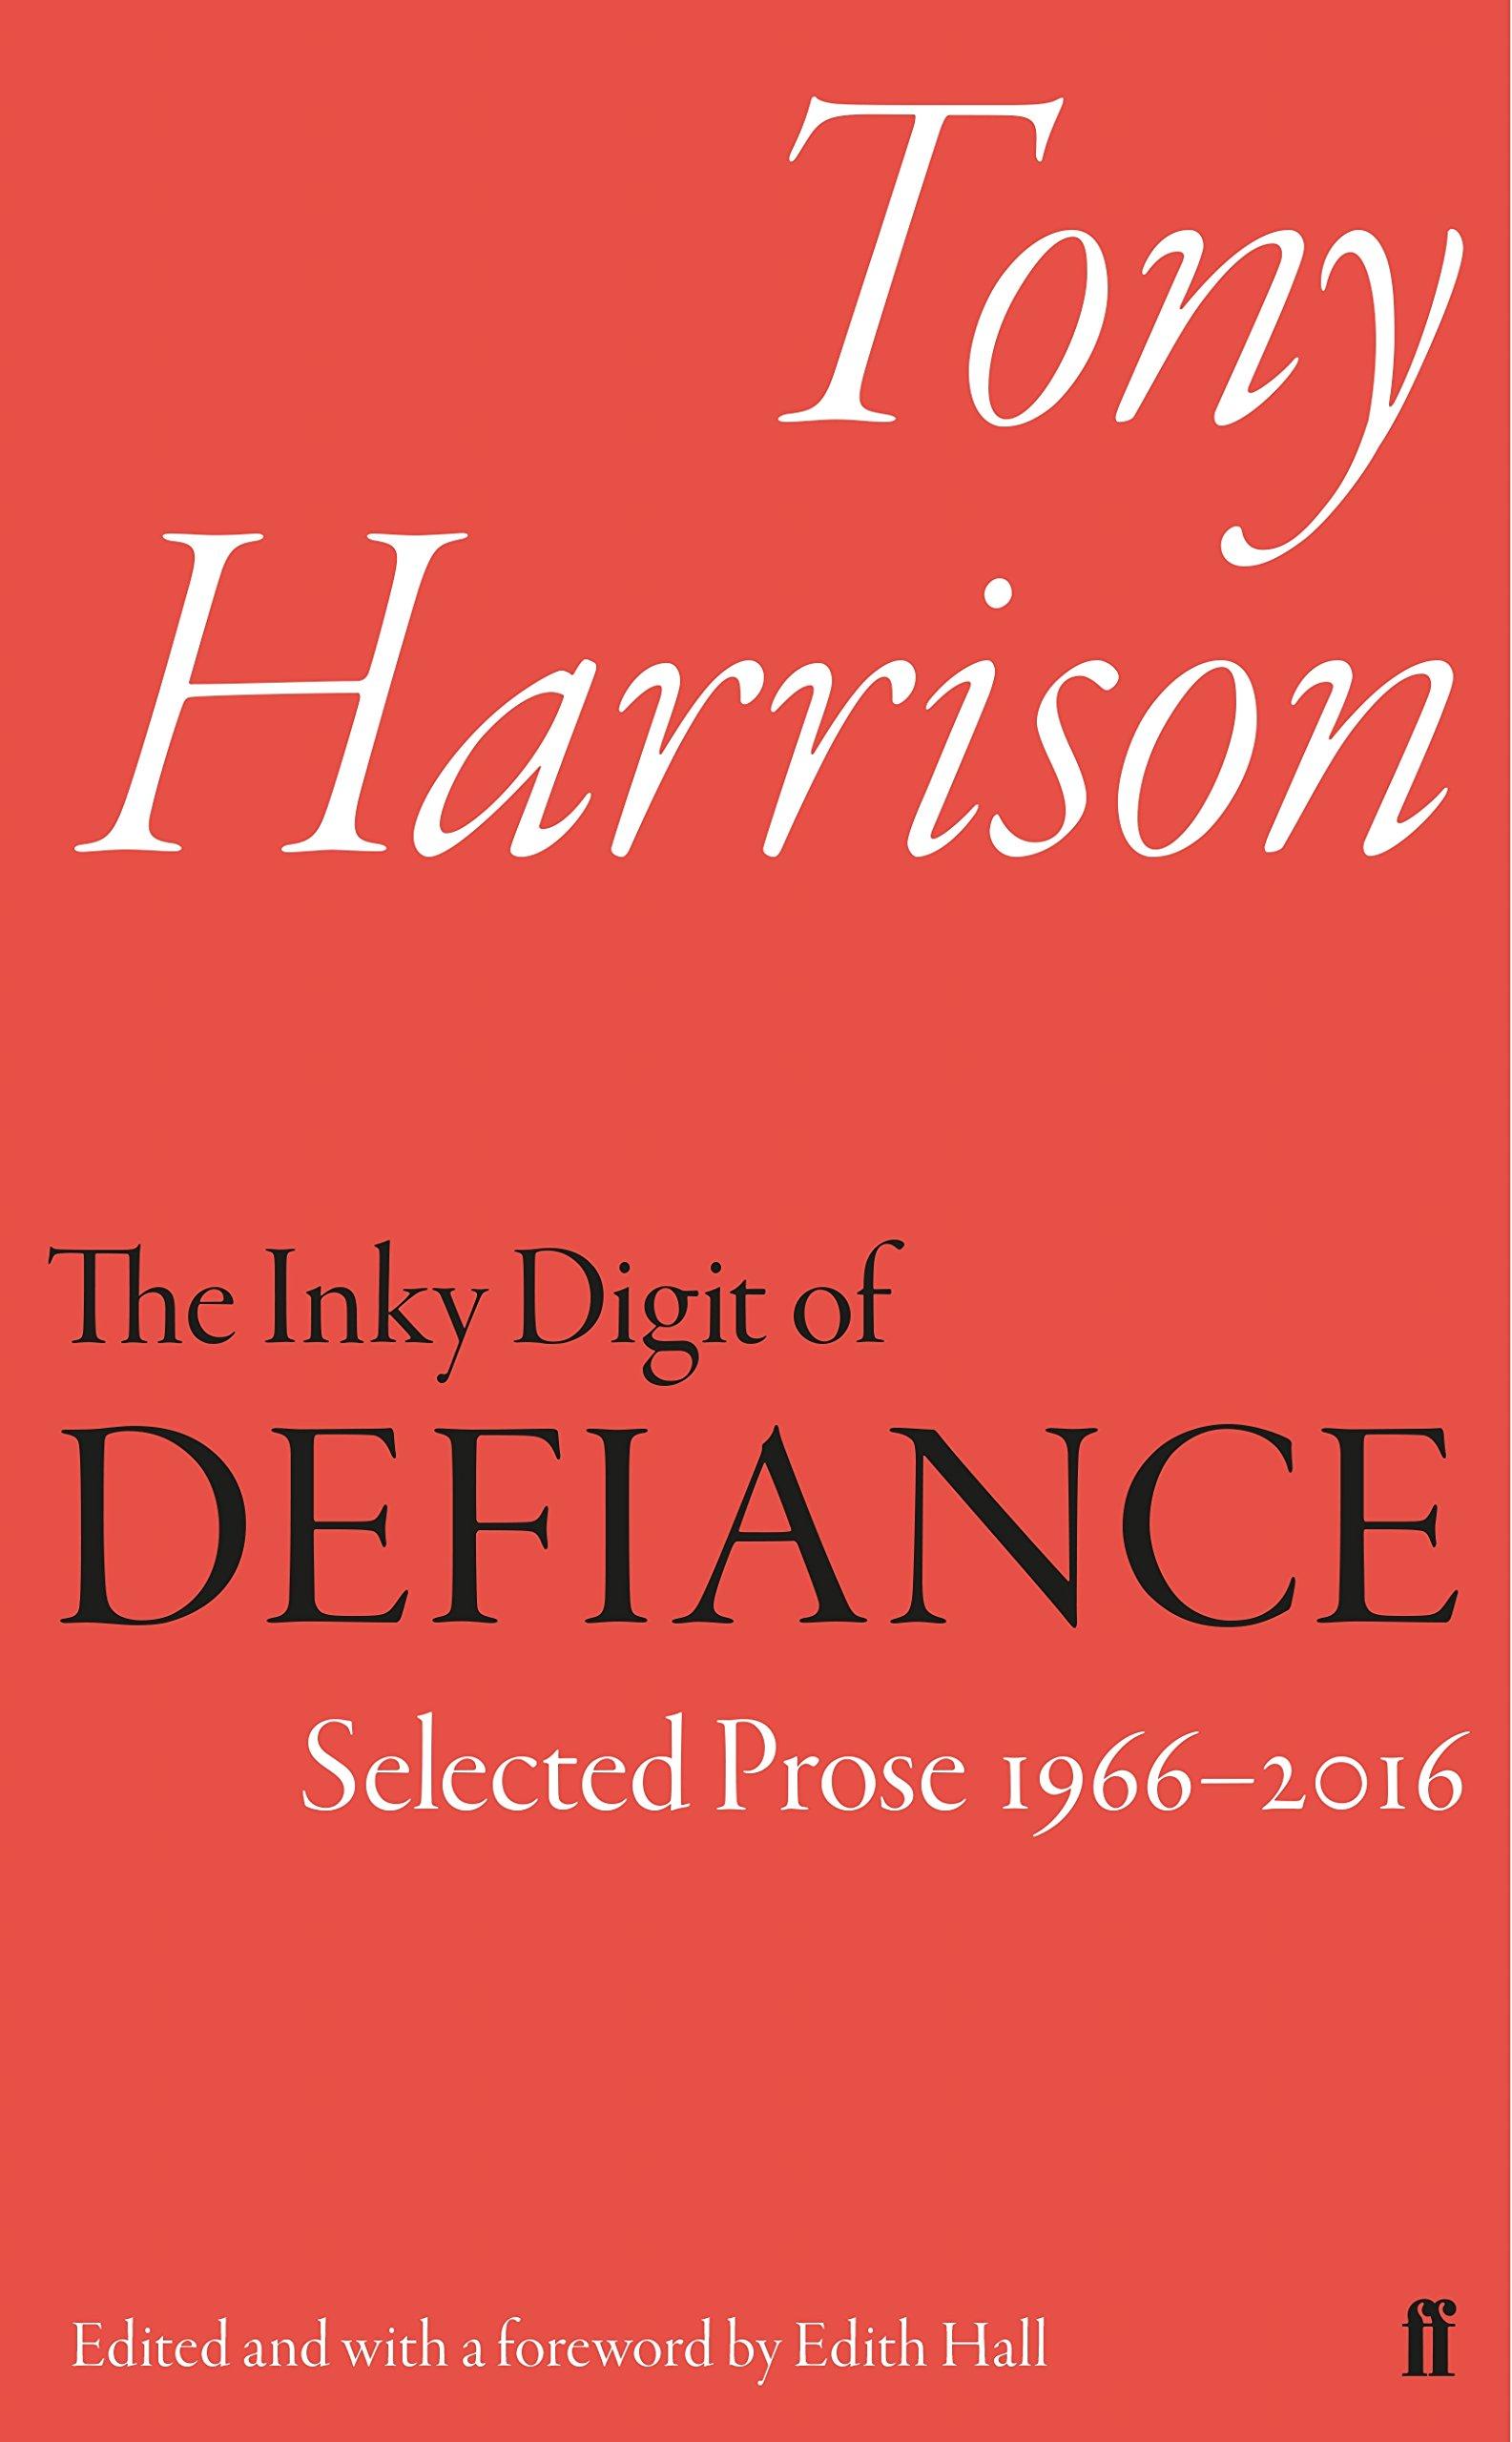 Read Online The Inky Digit of Defiance: Tony Harrison: Selected Prose 1966-2016 pdf epub